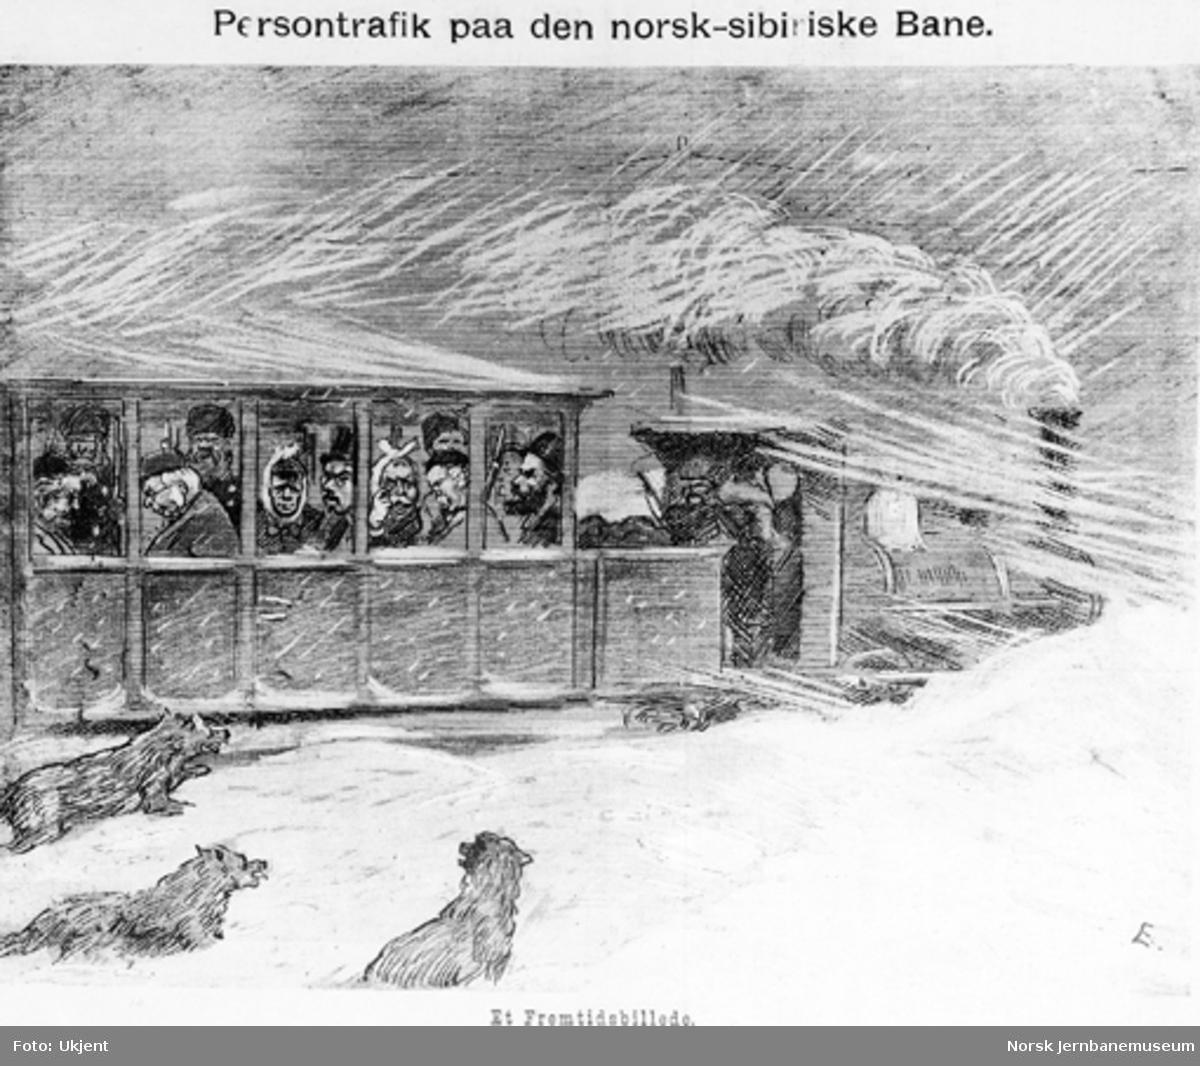 Humoristisk tegning : Persontrafikk paa den norsk-sibiriske Bane